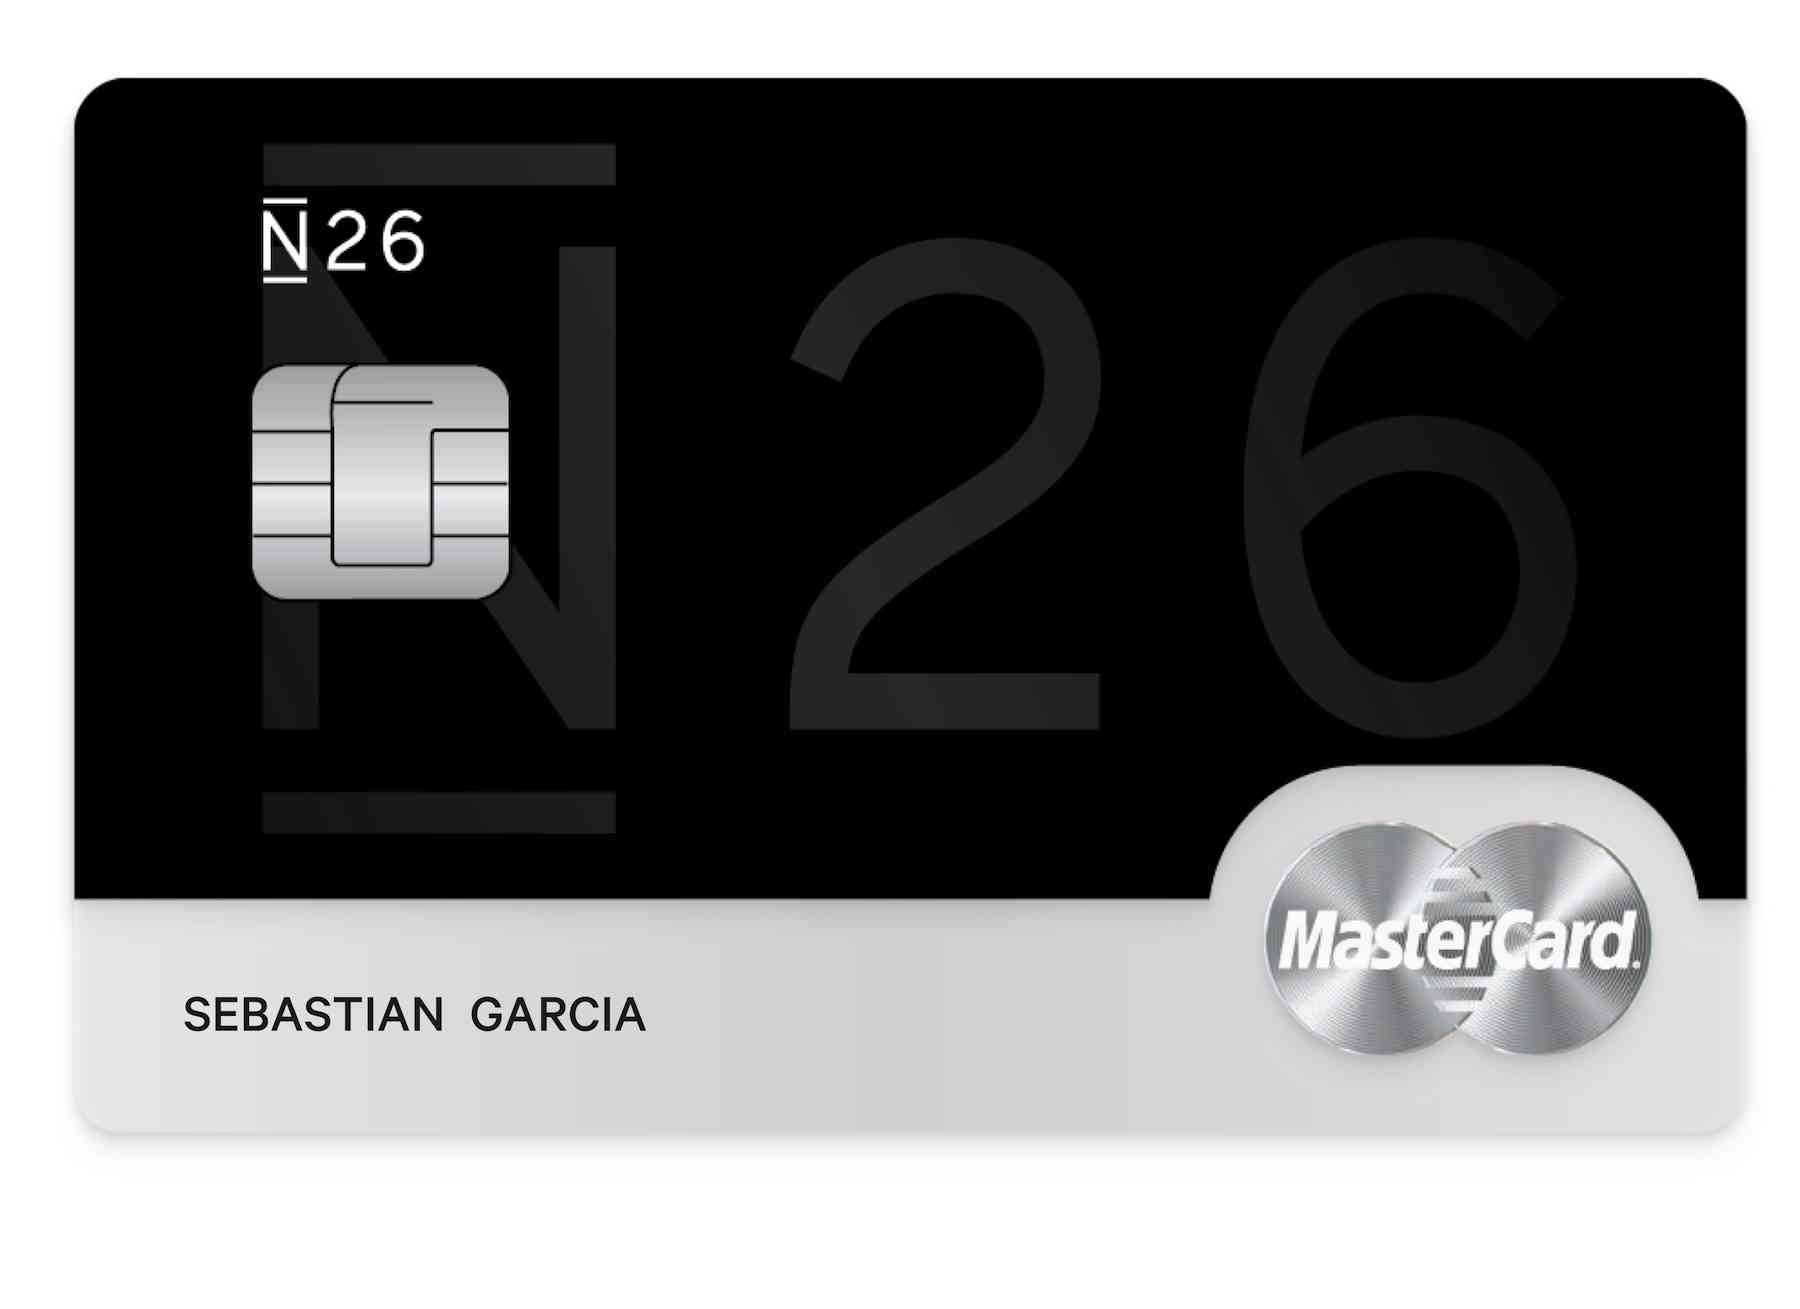 Mastercad black N26 banco